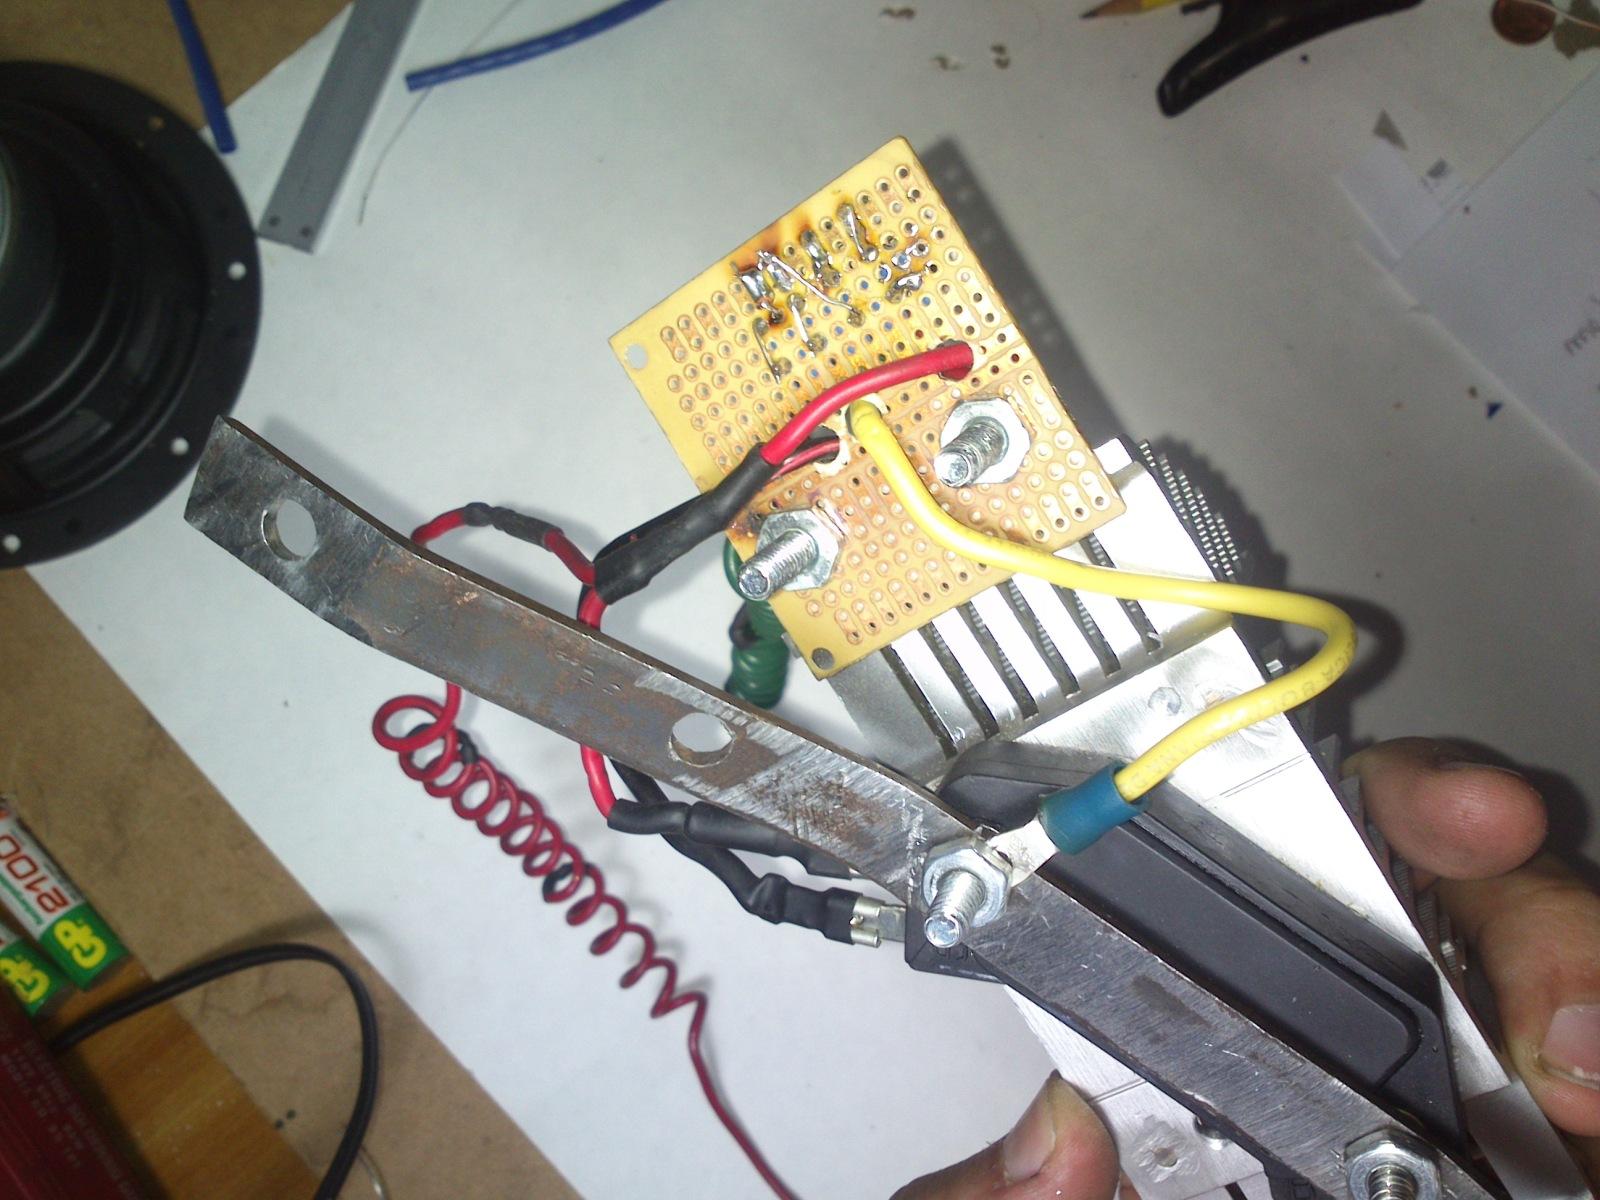 Encendido transistorizado: La otra alternativa. 35c2wi9